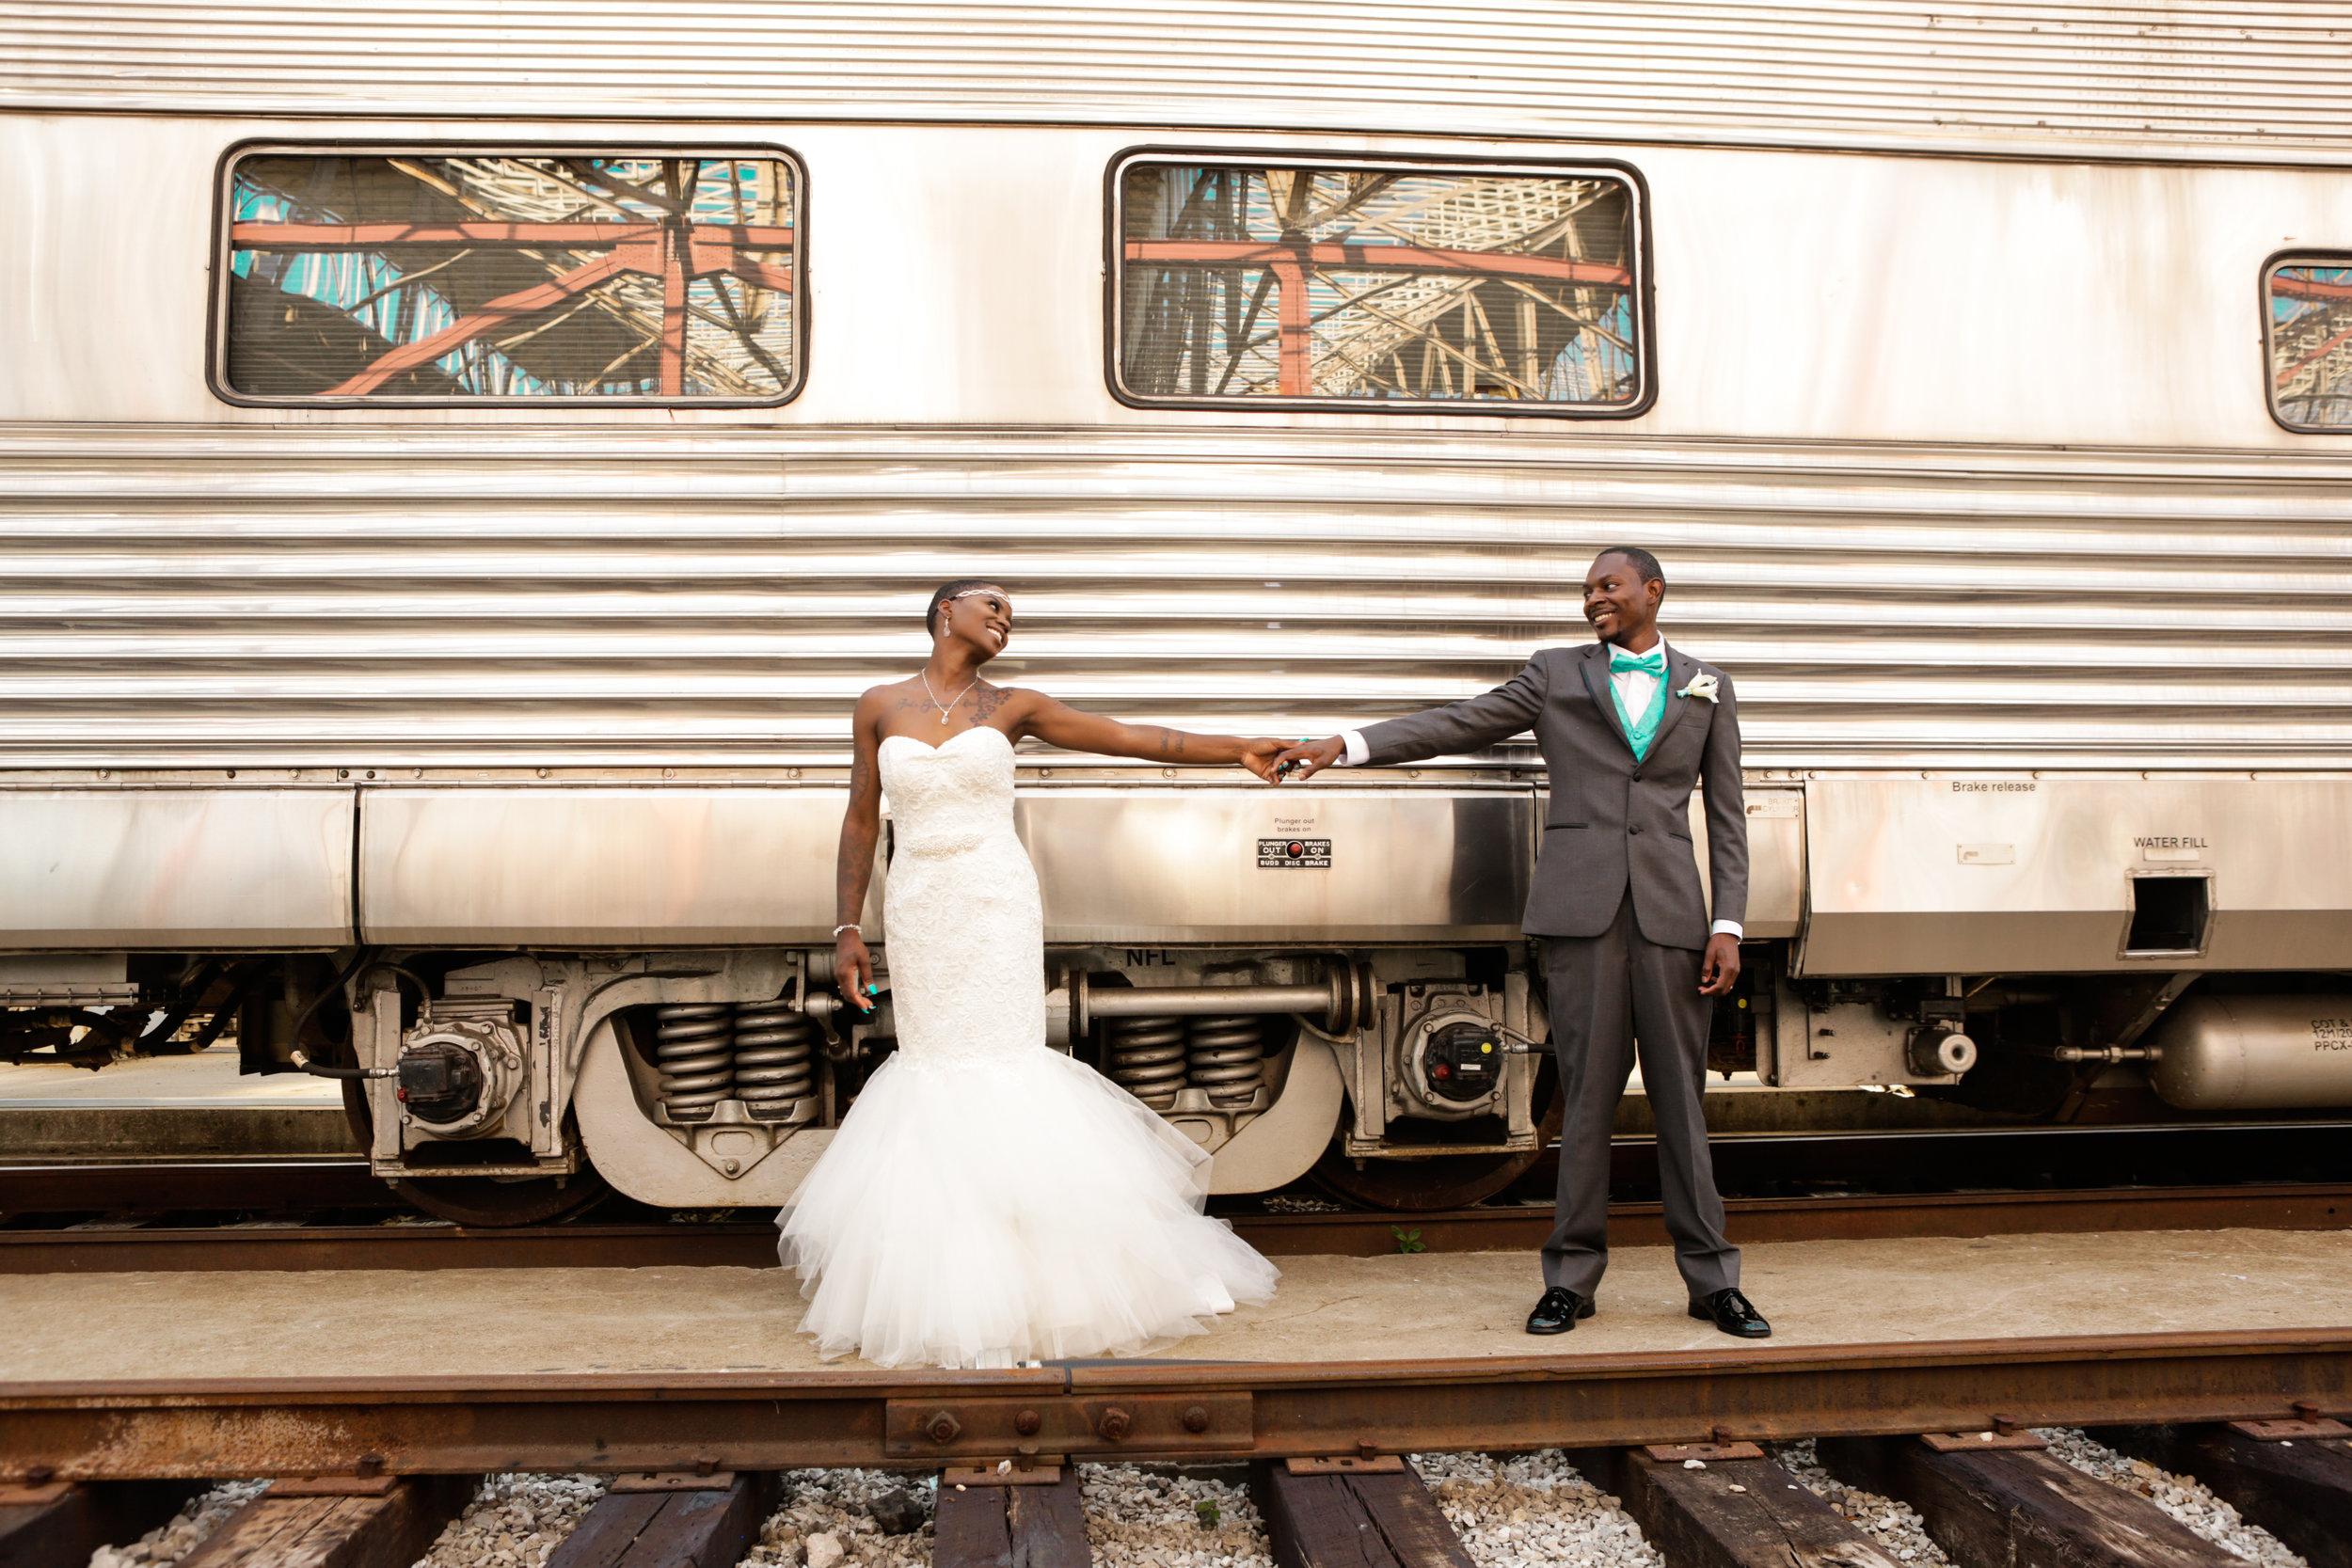 St. Louis Photographer St. Charles Photographer Engagement Wedding Photographer (13).jpg